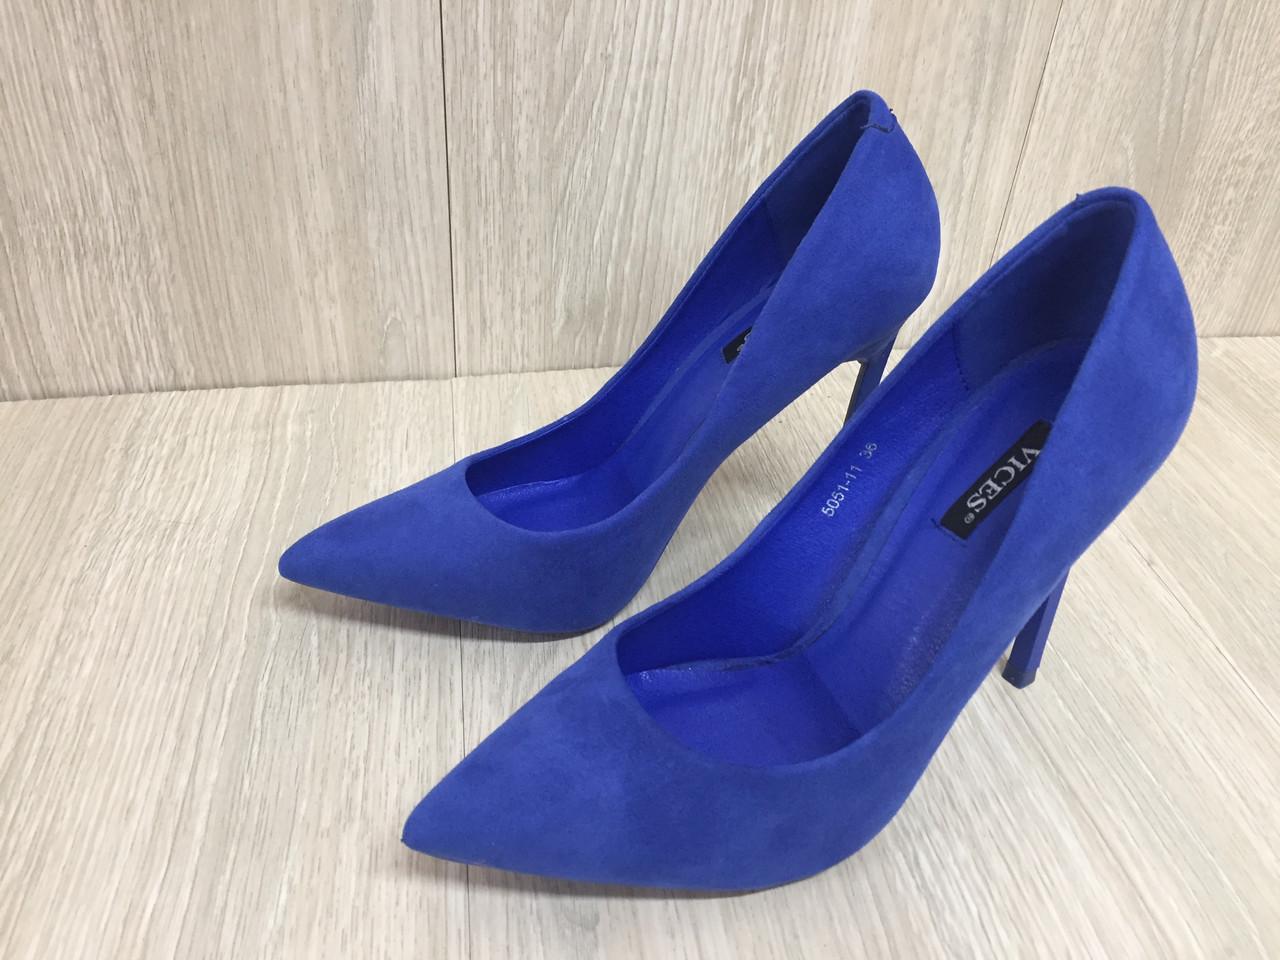 Туфли лодочки VICES  продажа, цена в Хмельницком. туфли женские от ... 452f64d13a5